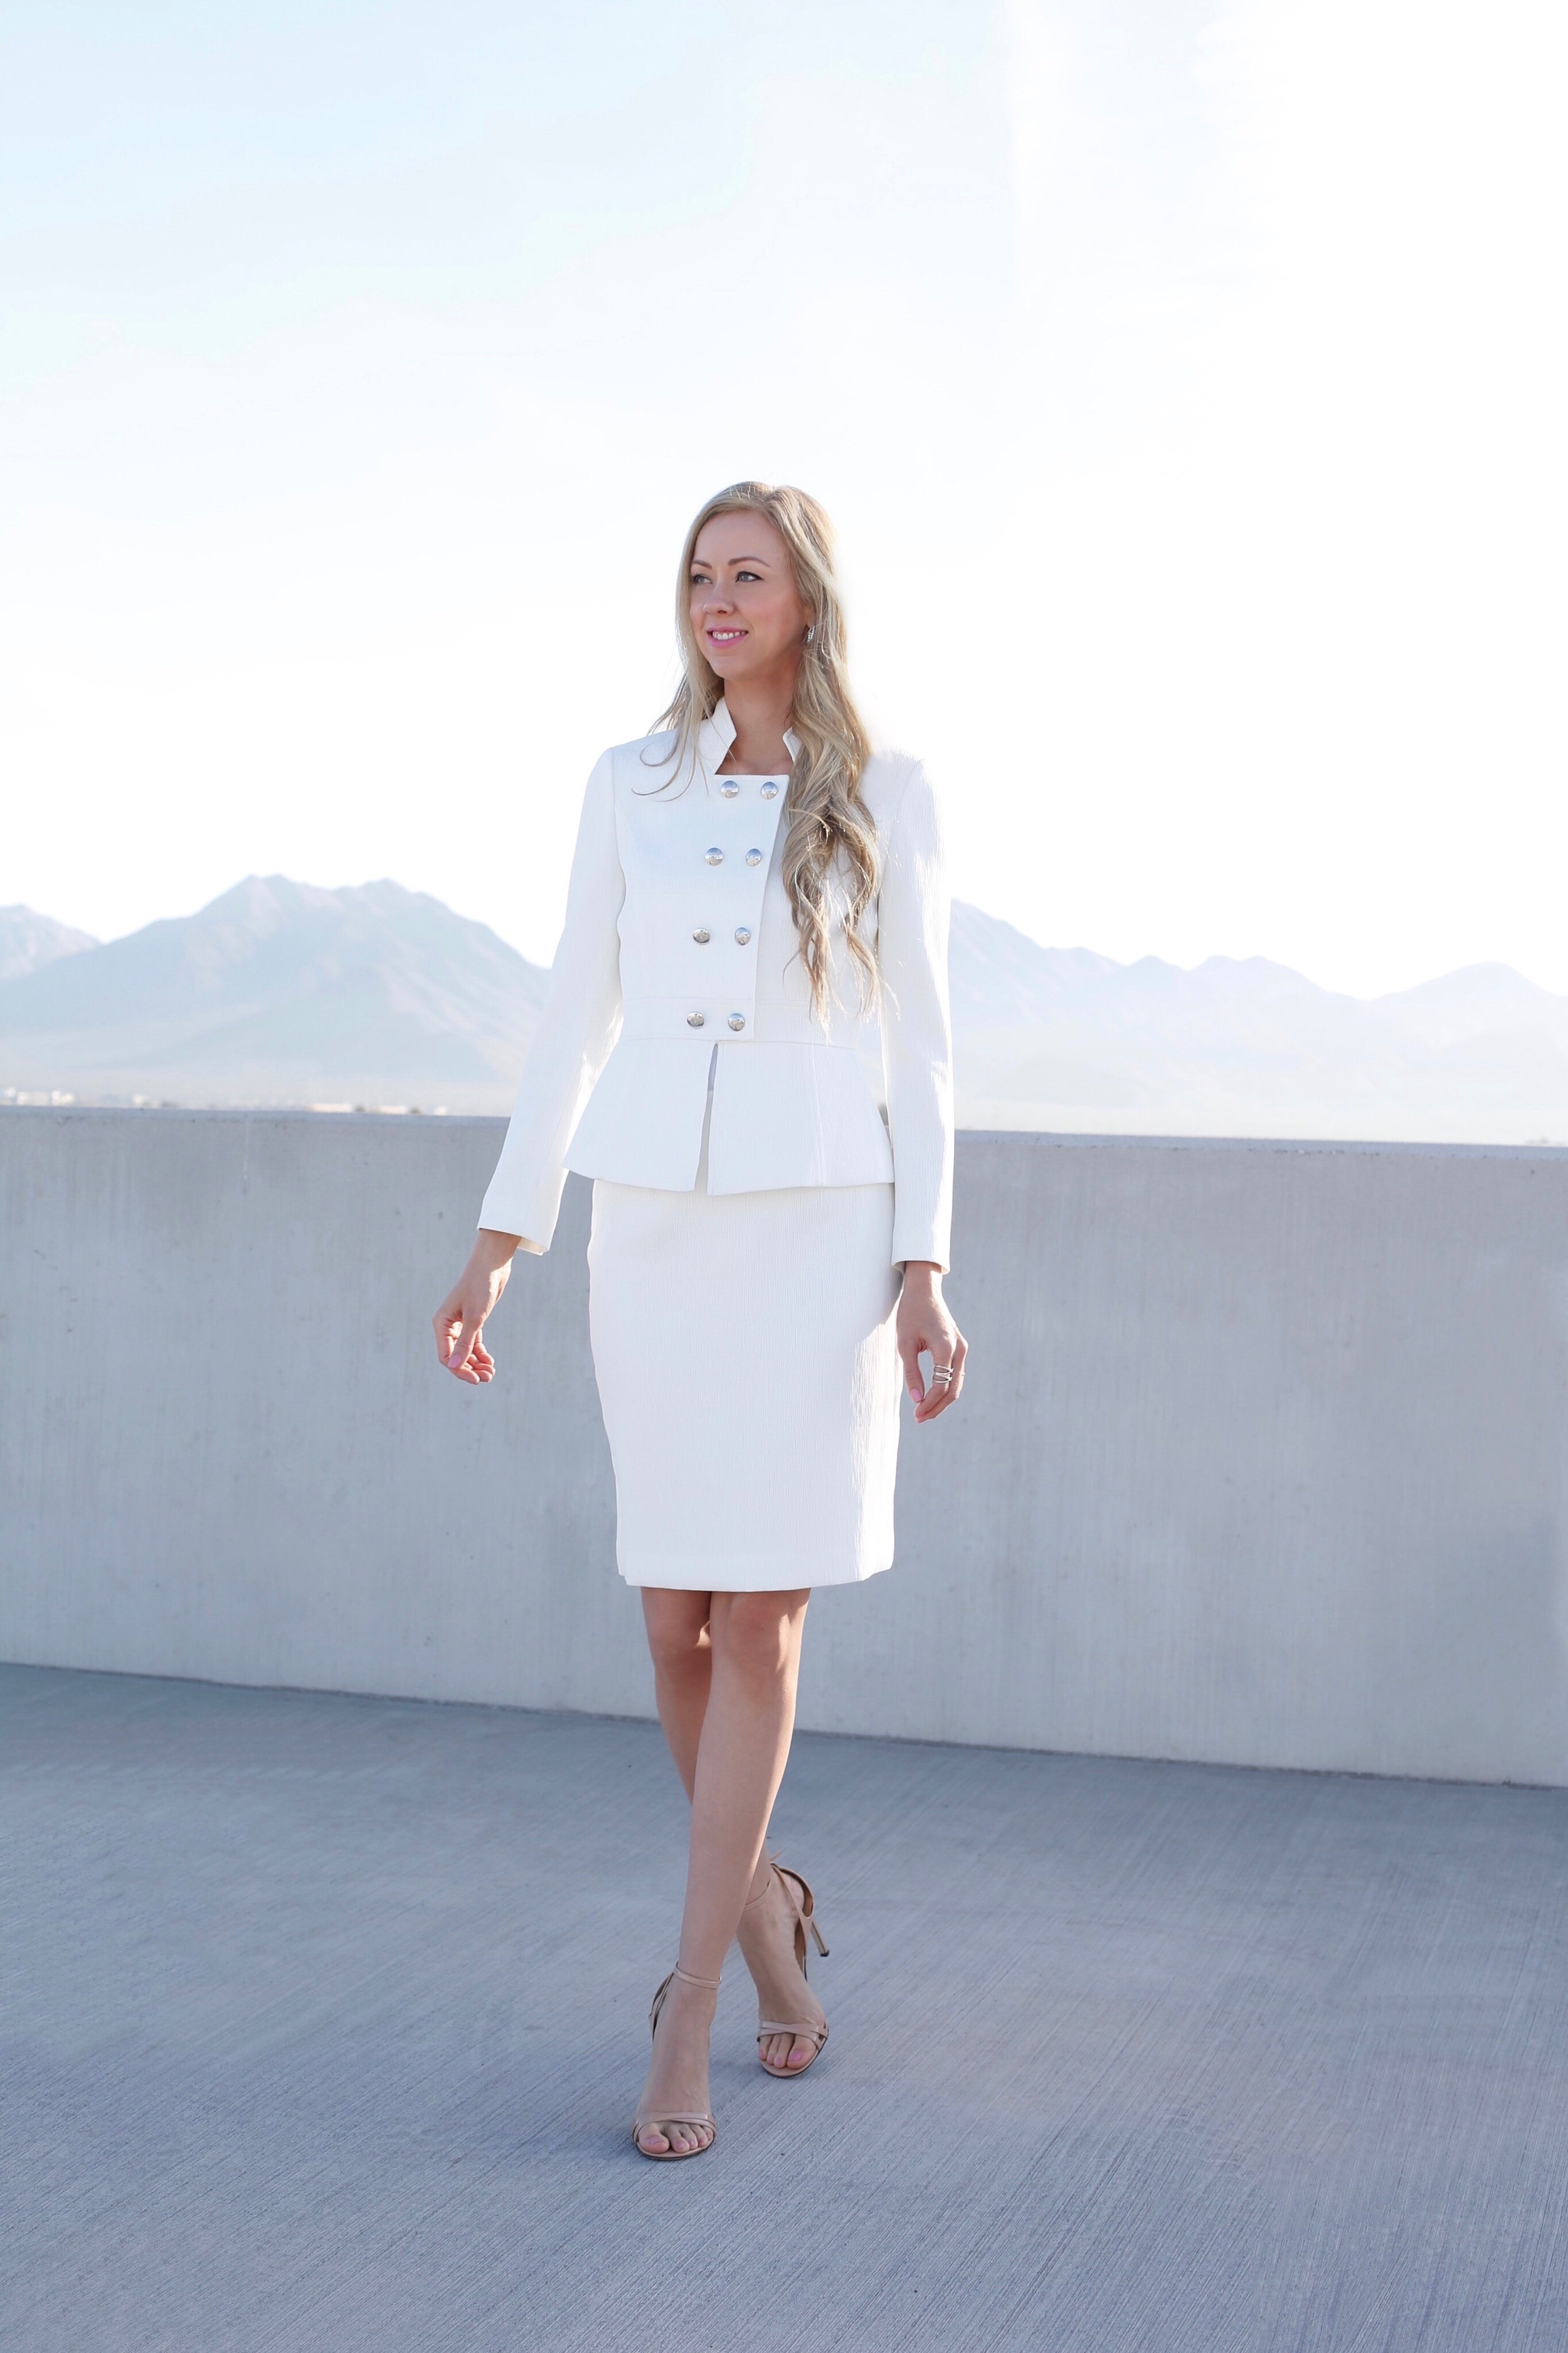 Tahari-Asl-white-skirt-suit-dillards-macys-lord-and-taylor.jpg